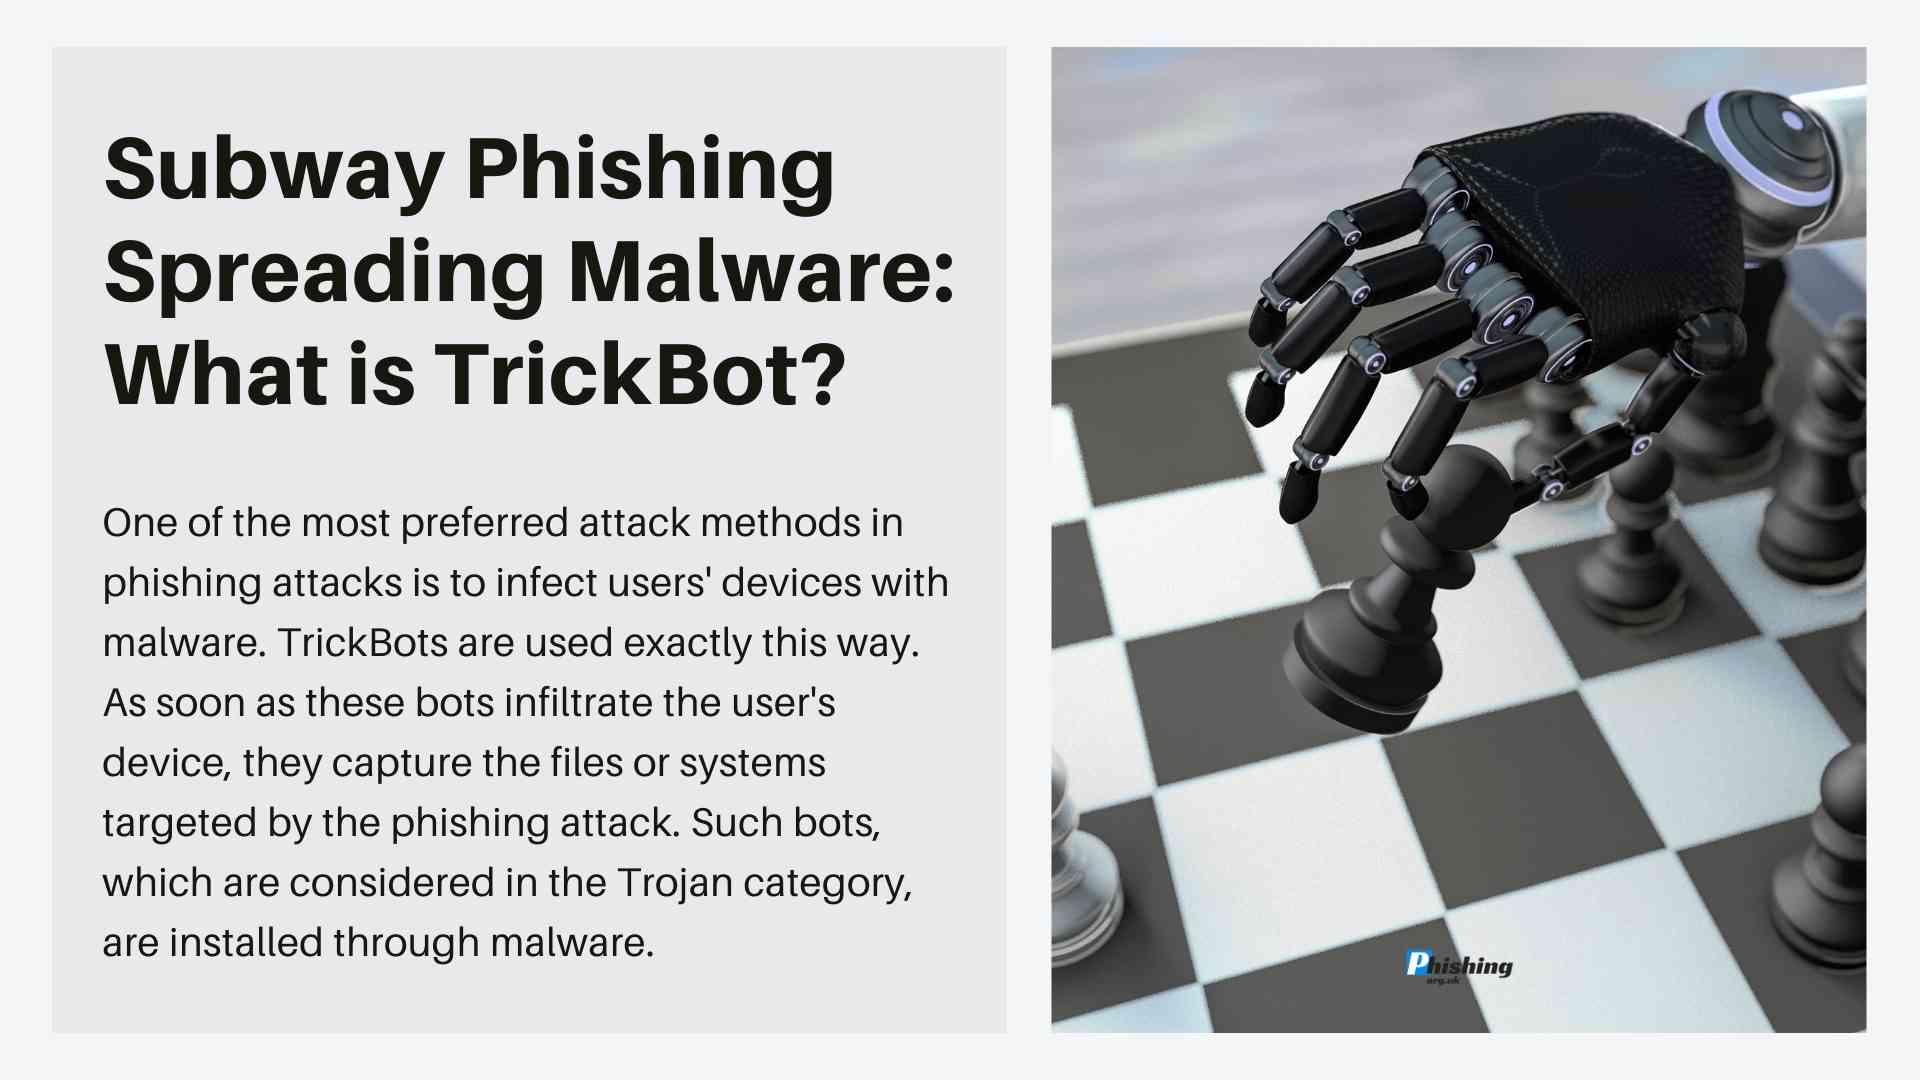 Subway Phishing Spreading Malware